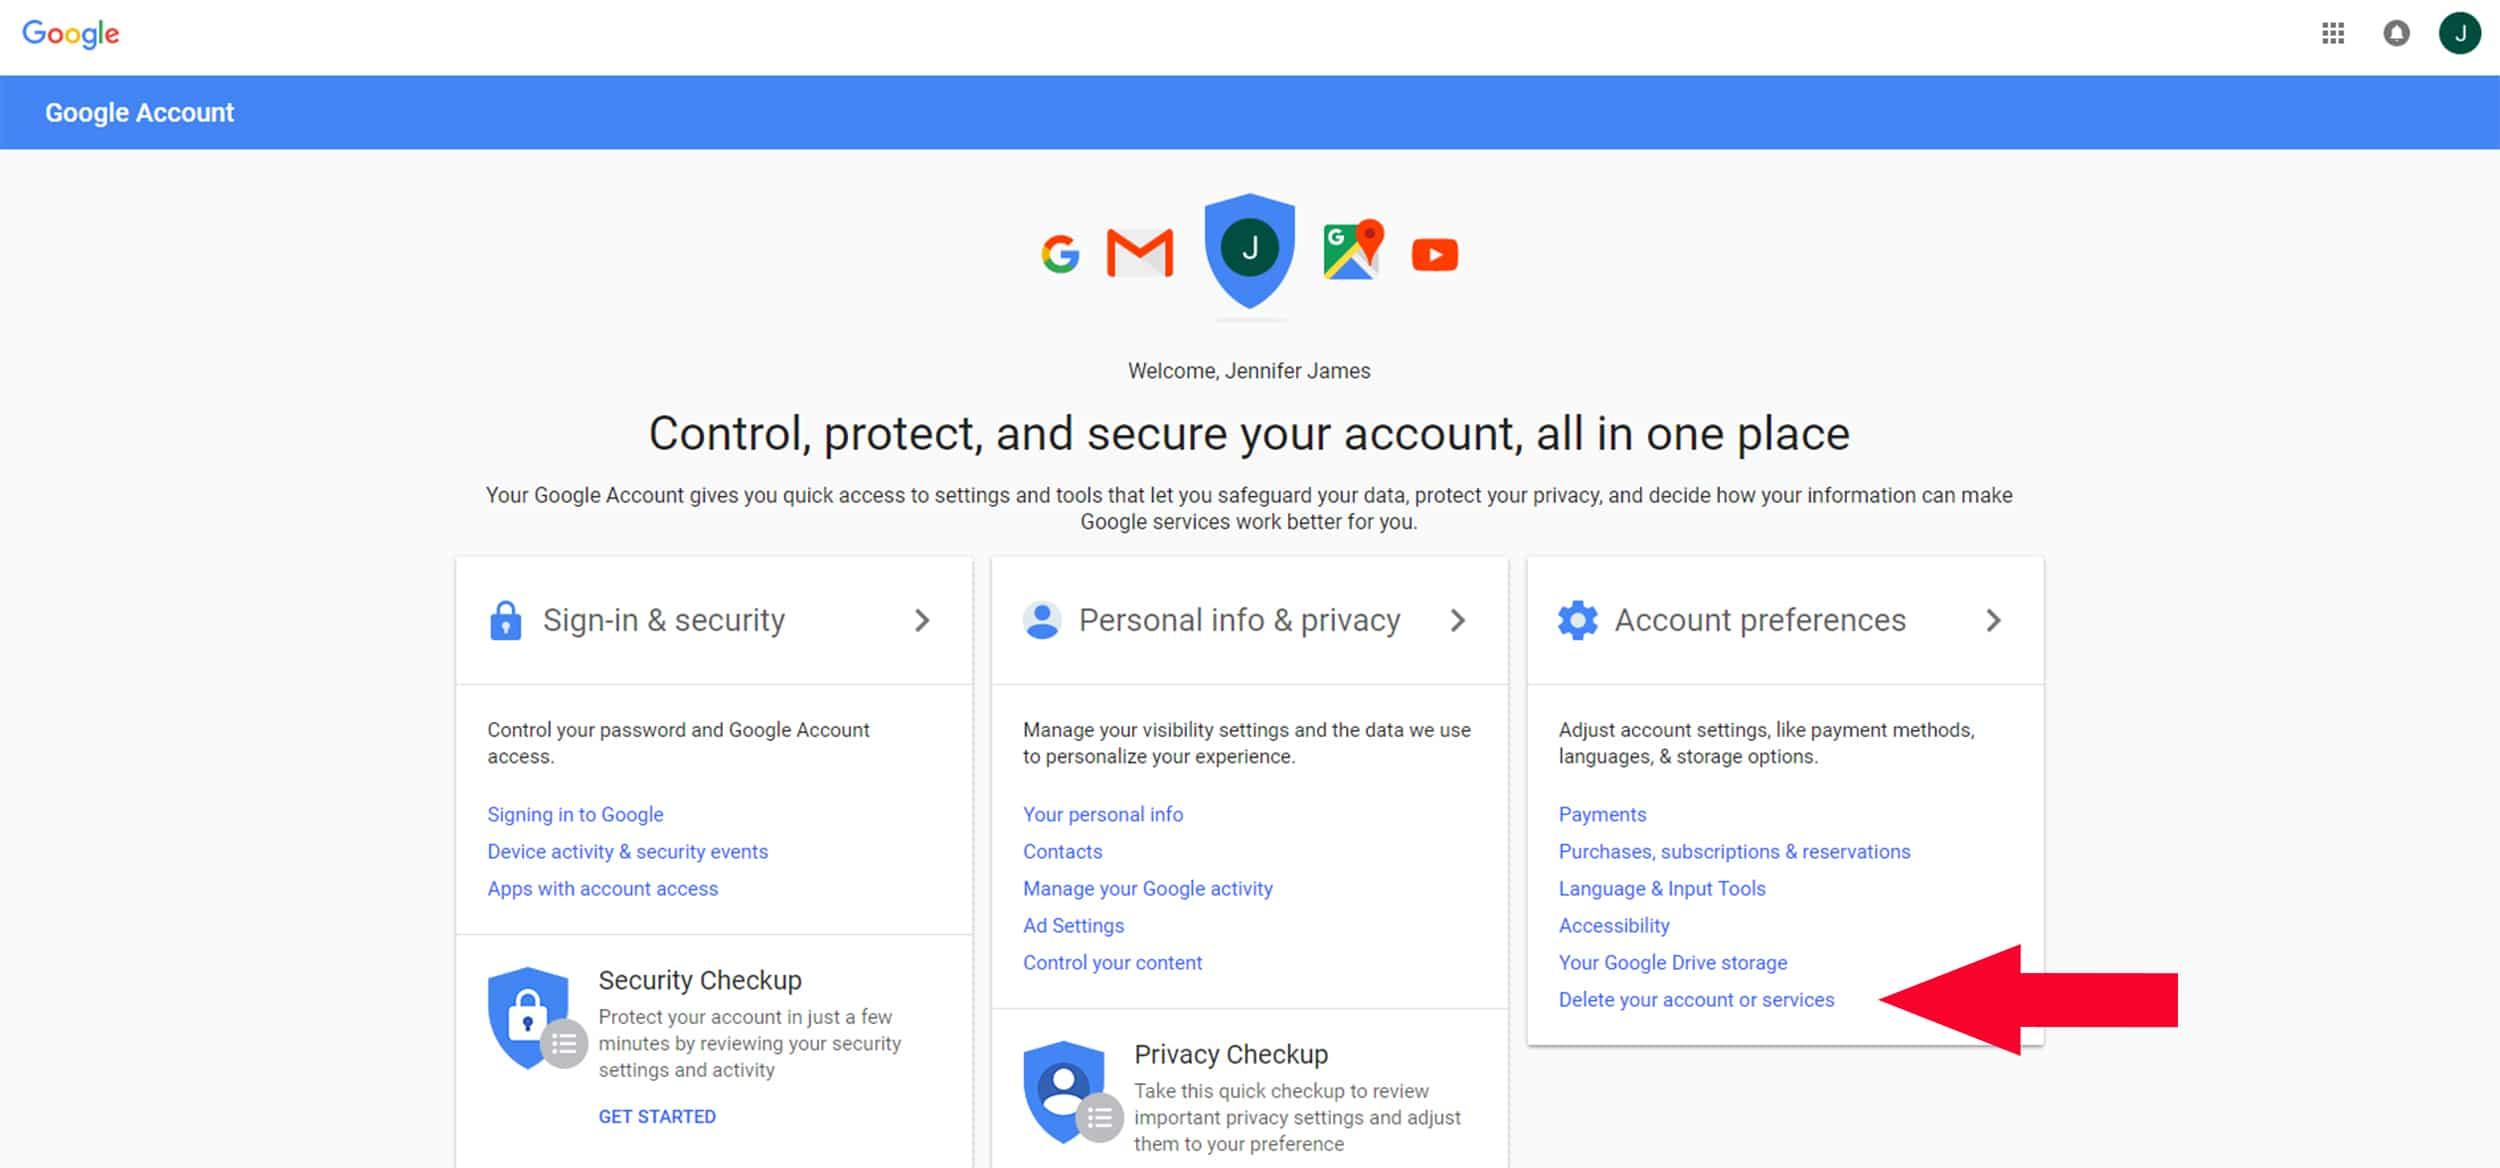 How to Delete a Google Account | Remove Google Accounts